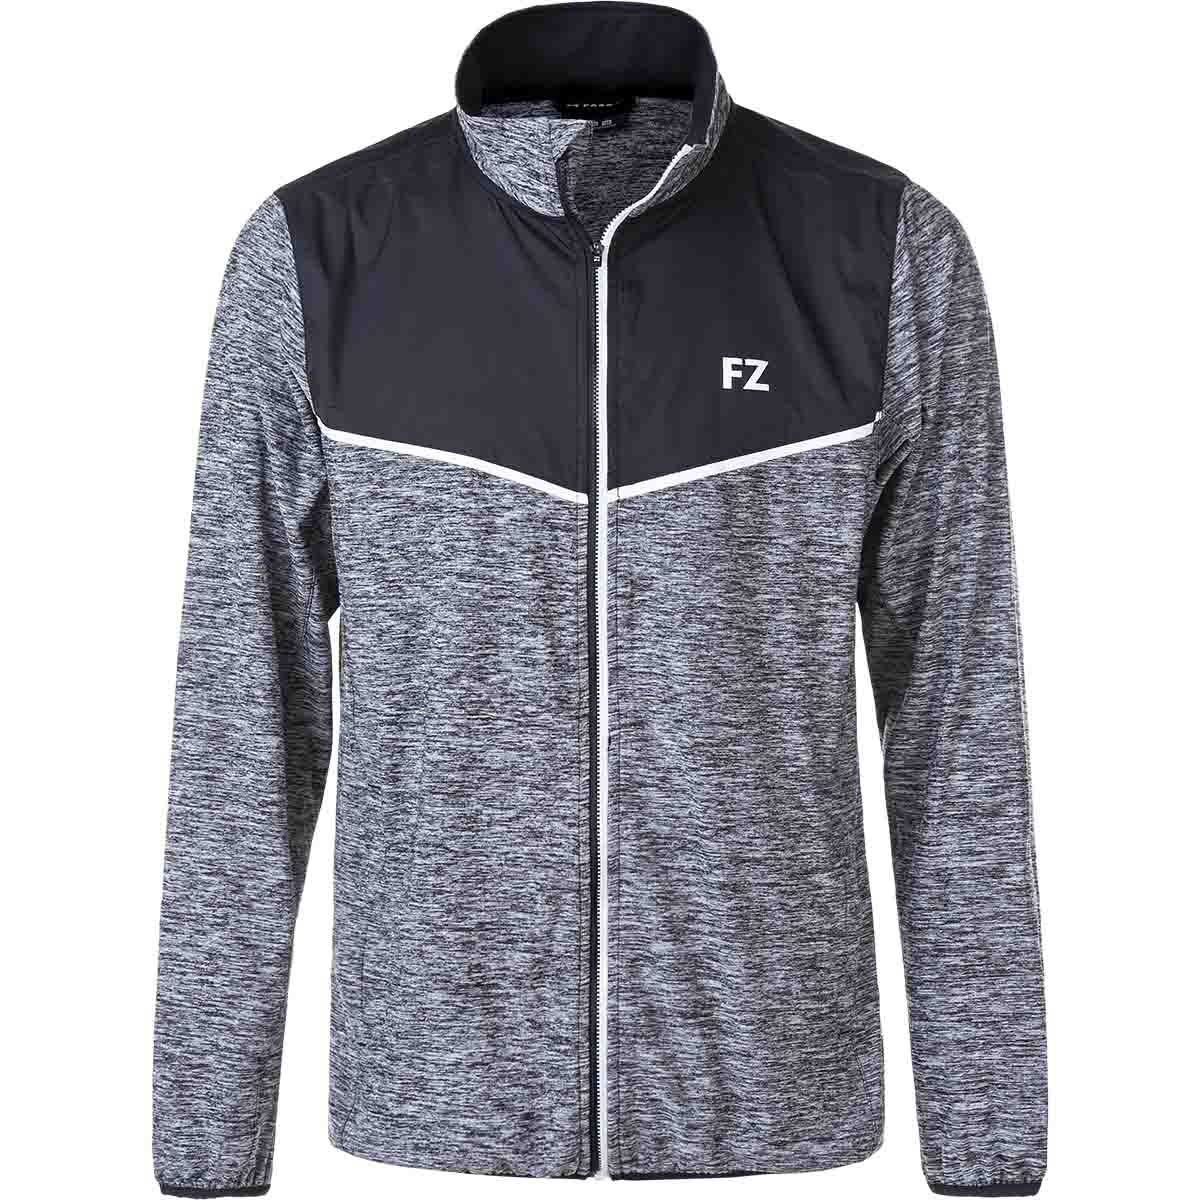 FZ Hereford jr. jacket